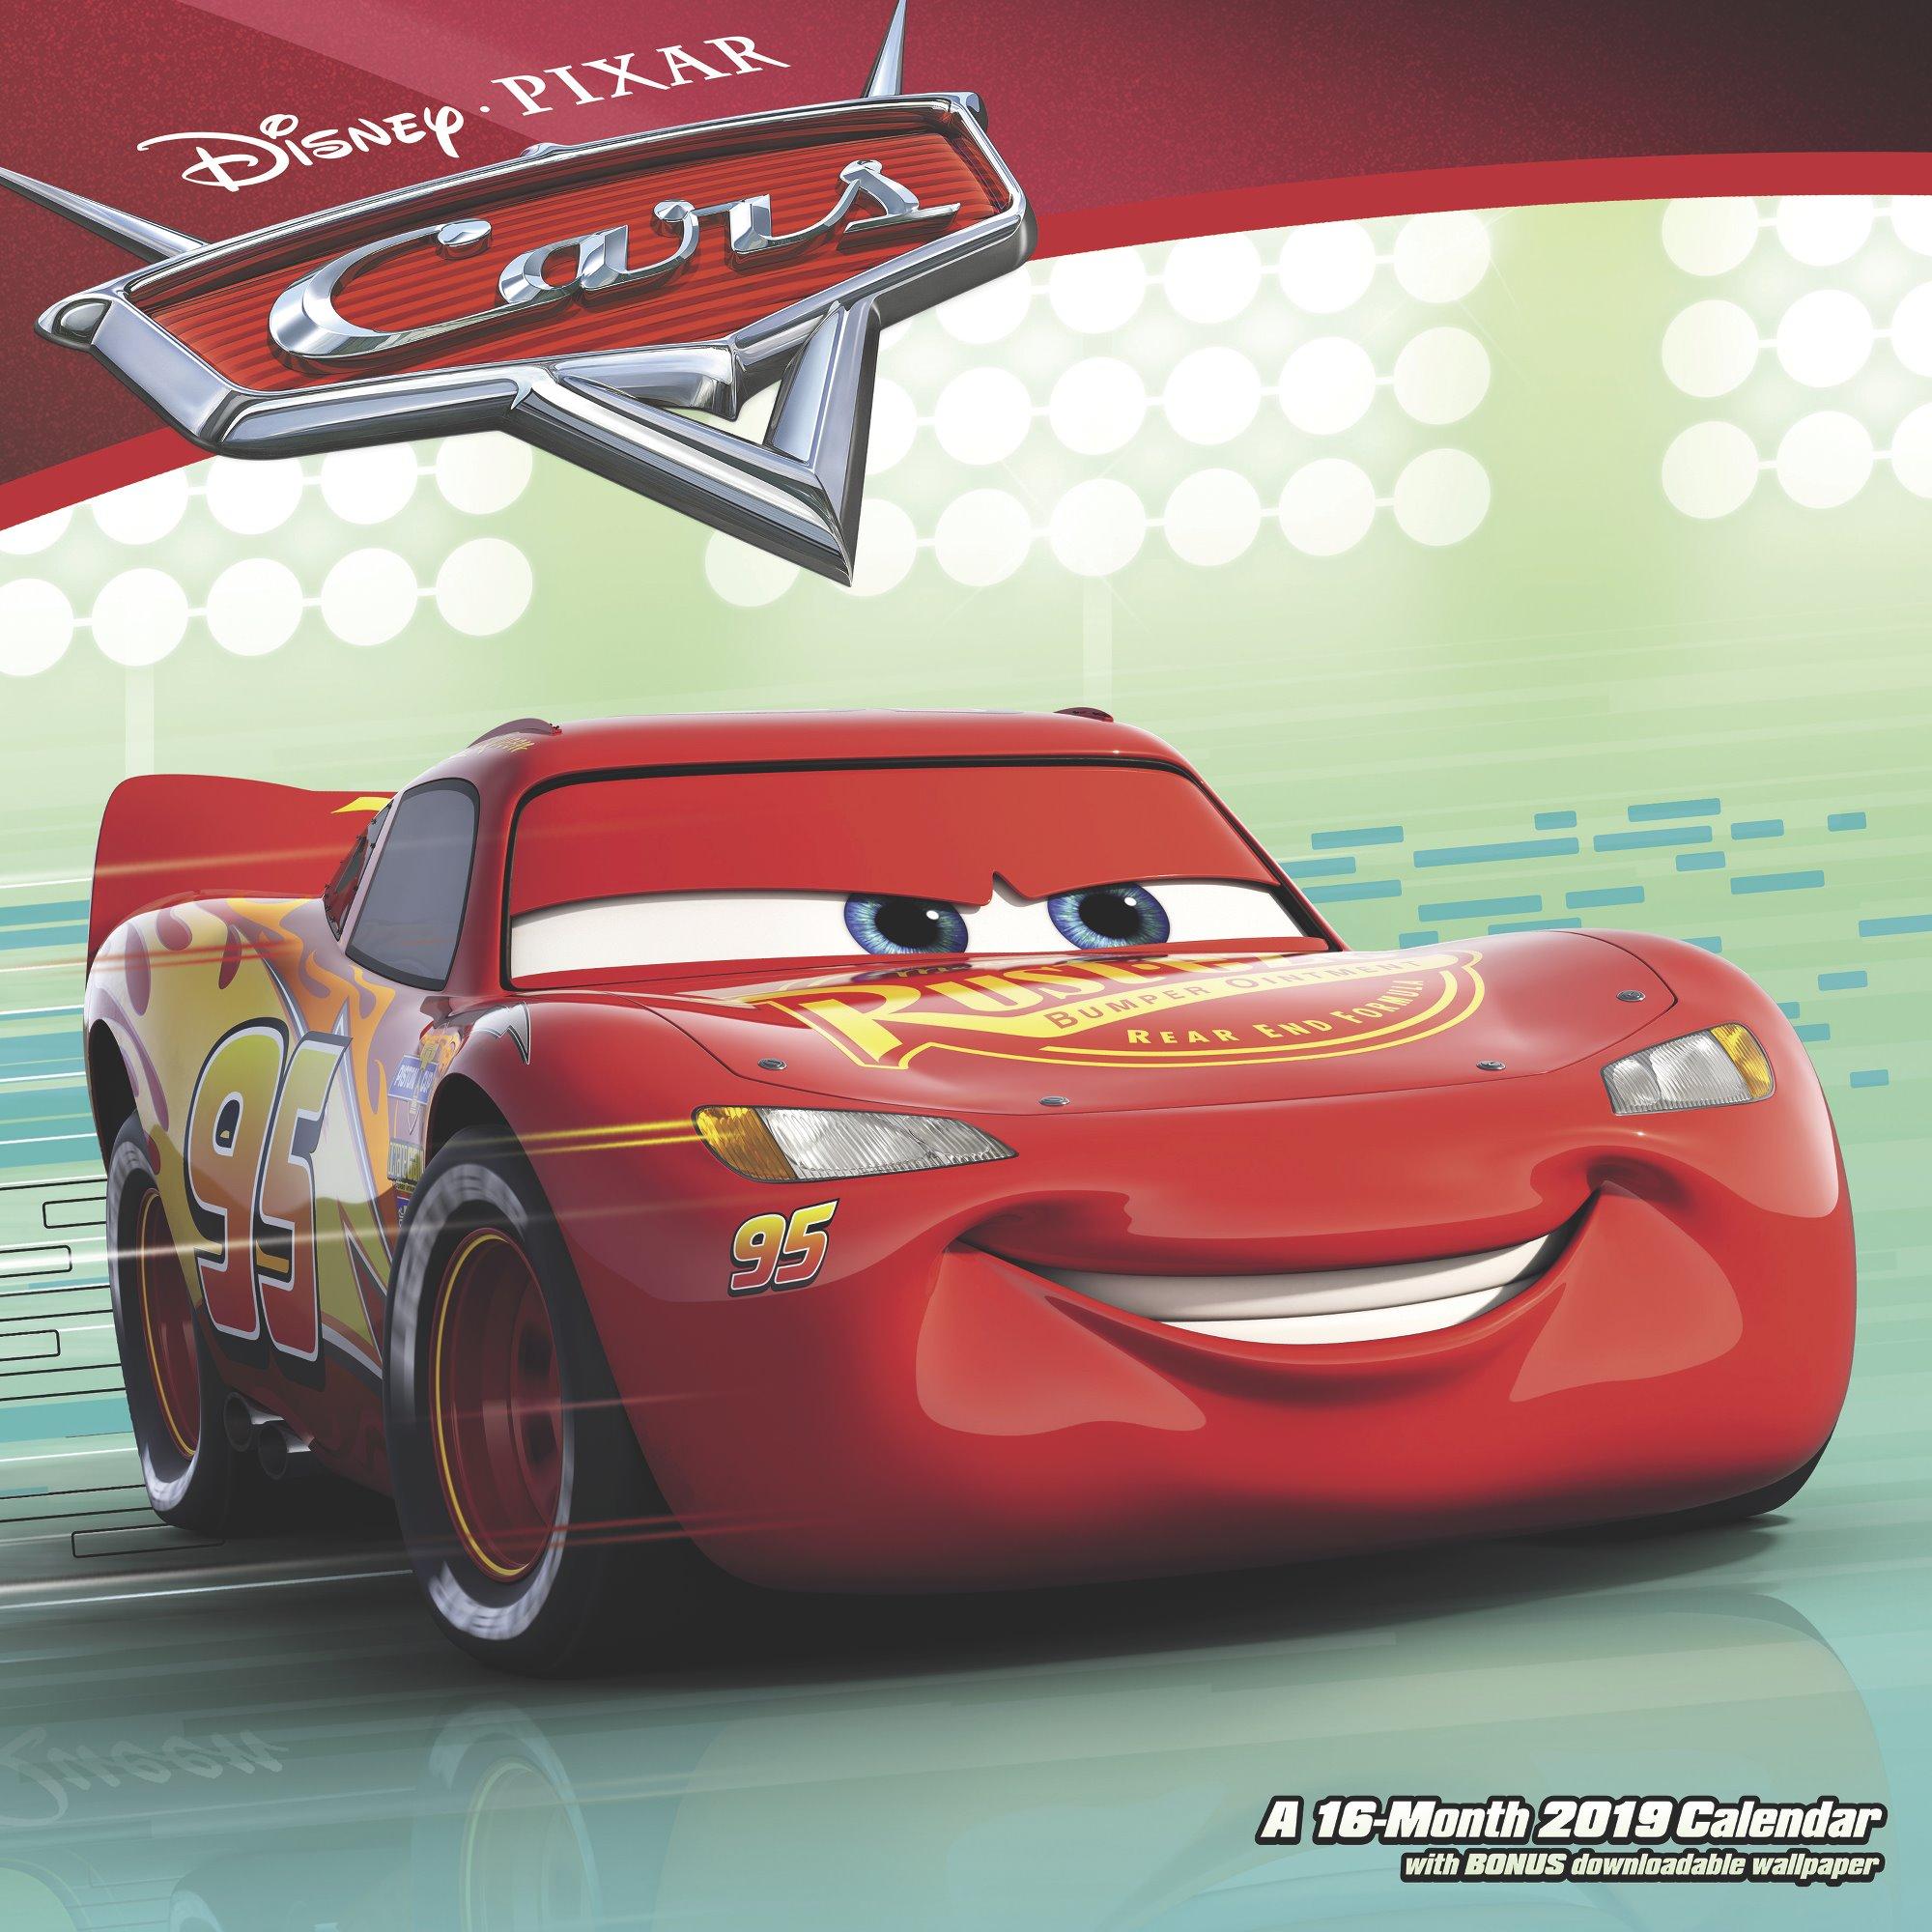 Mead Disney Pixar Cars Calendar - Disney